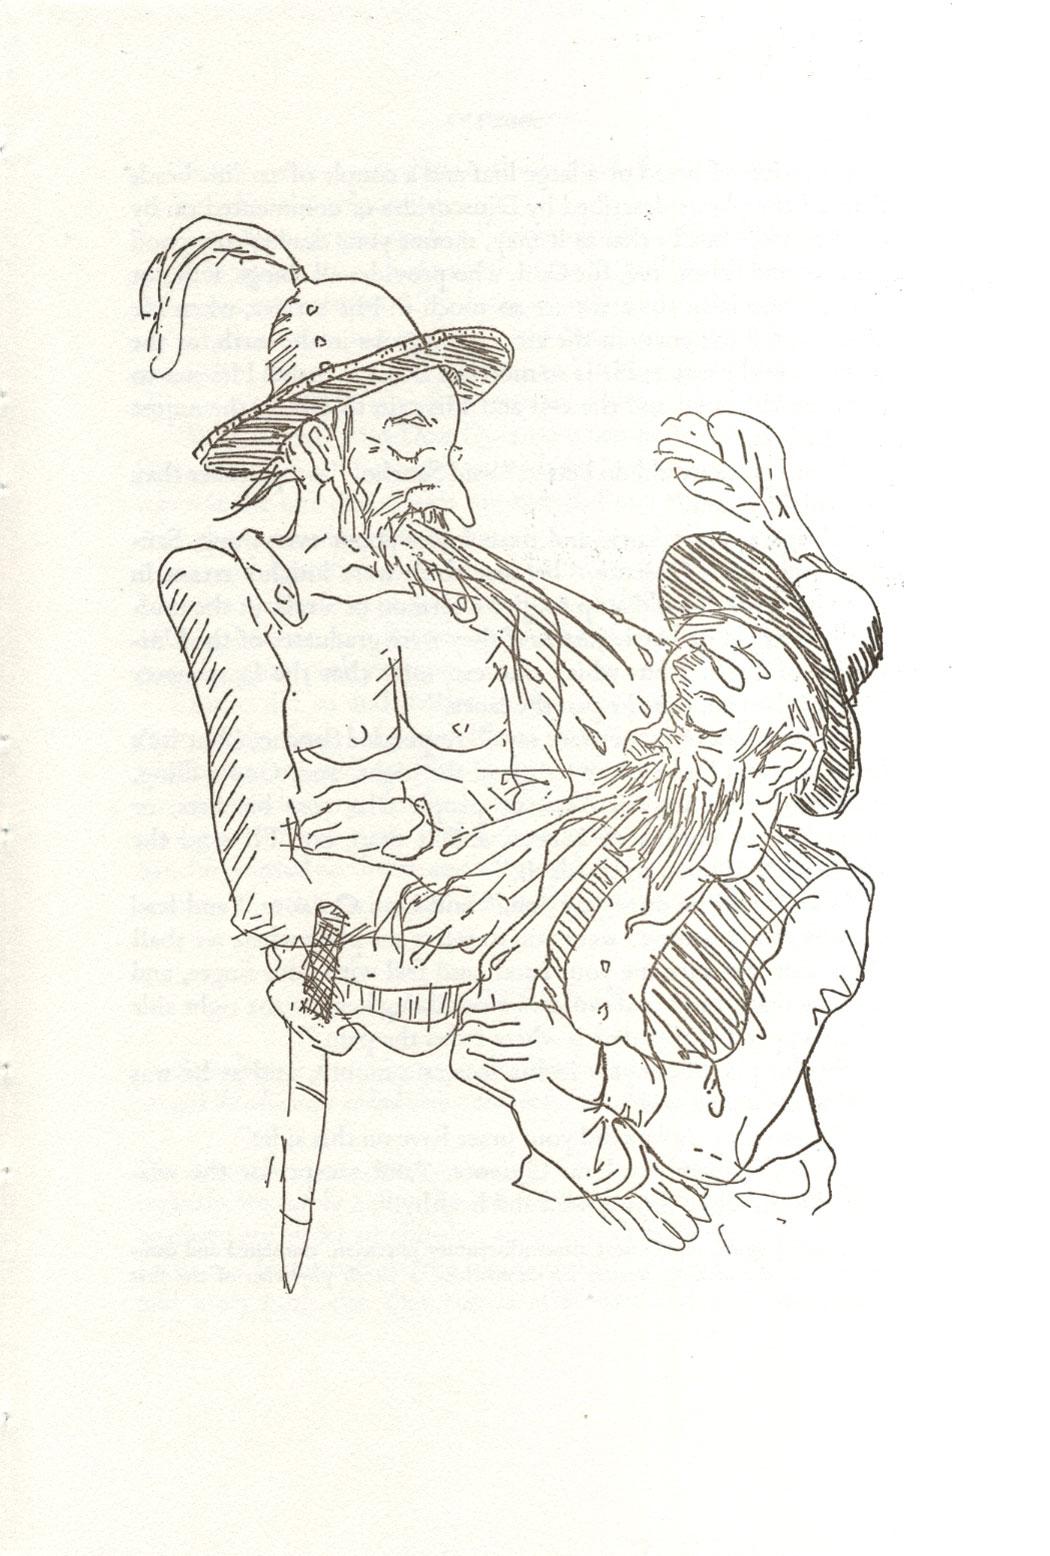 p.-173.DQ+Sancho.jpg